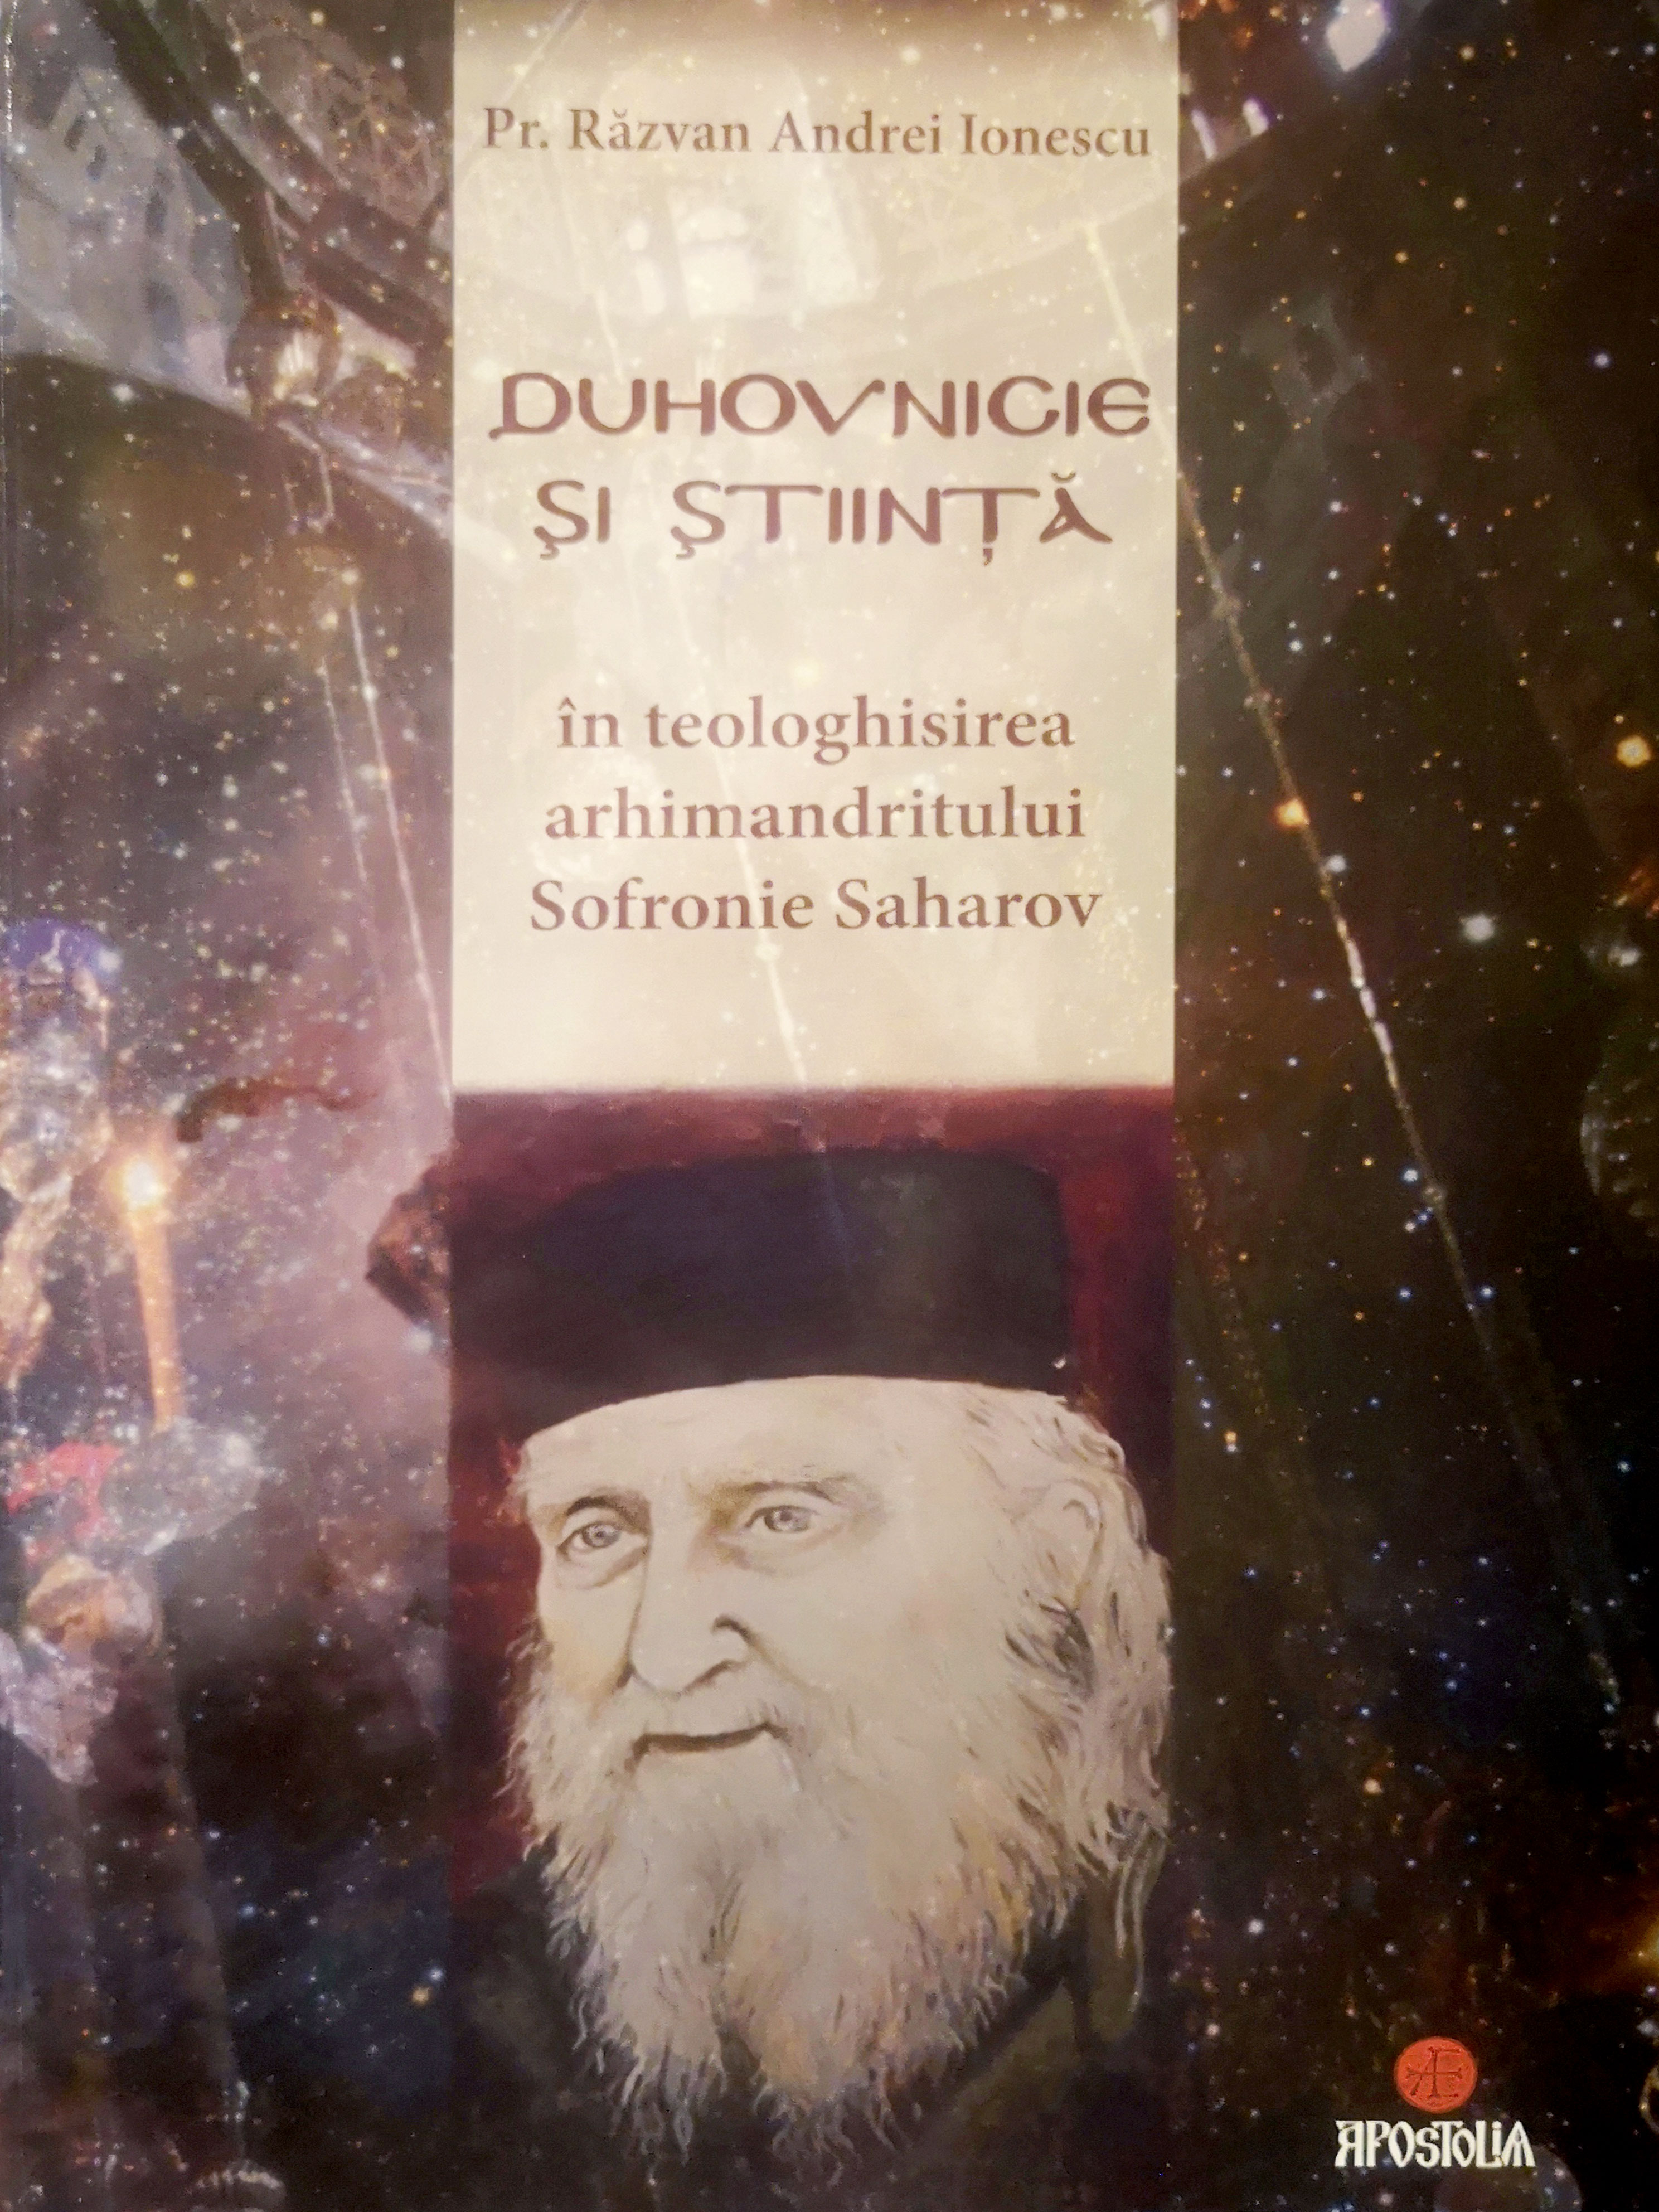 Preot Razvan Andrei IONESCU | Duhovnicie si stiinta in teologhisirea arhimandritului Sofronie Saharov